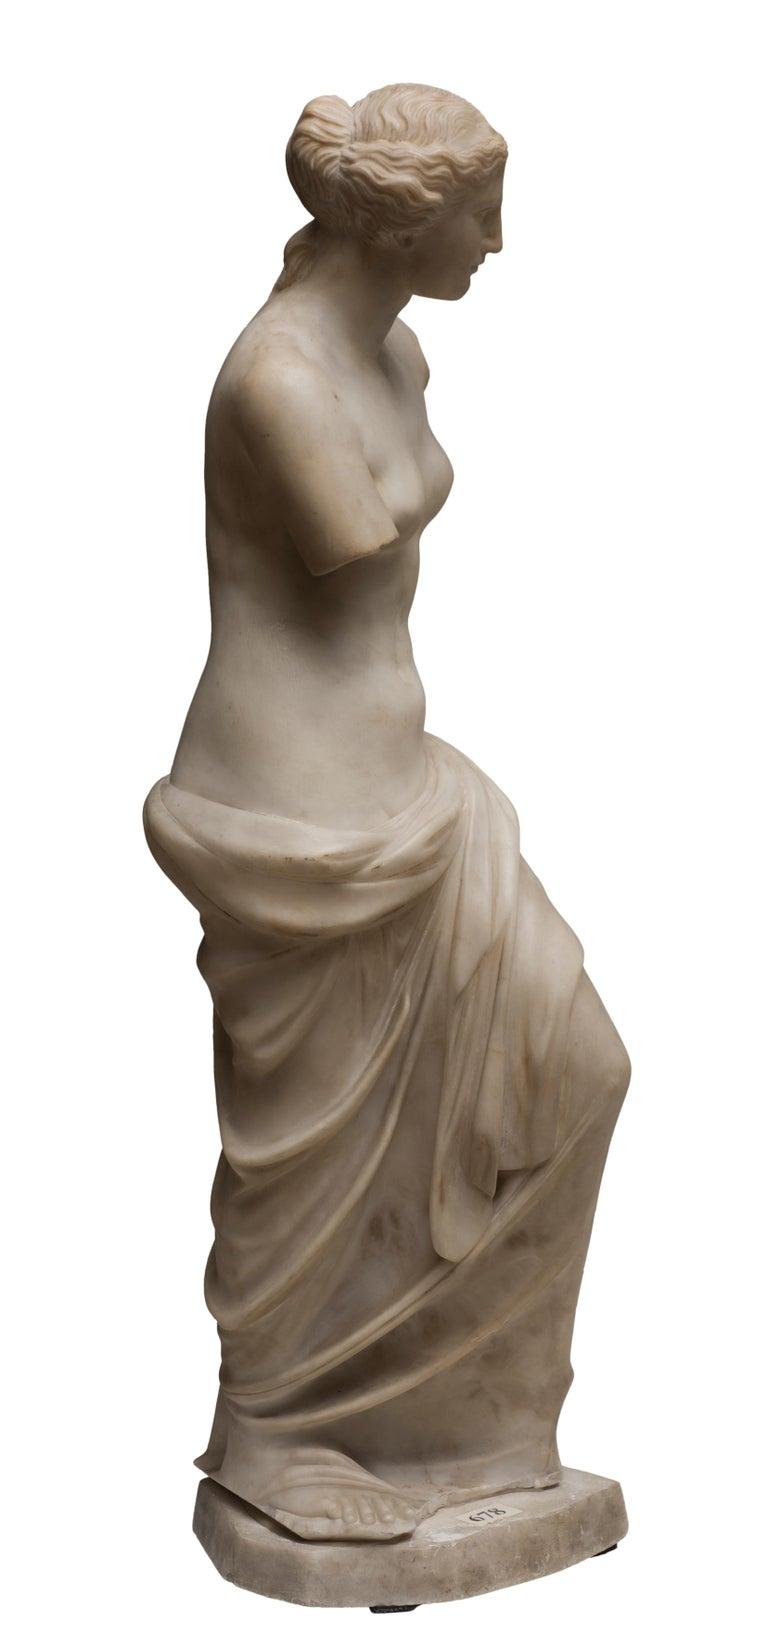 Carved Carrara Marble Sculpture Copy of Venus de Milo by French Sculptor, circa 1820 For Sale